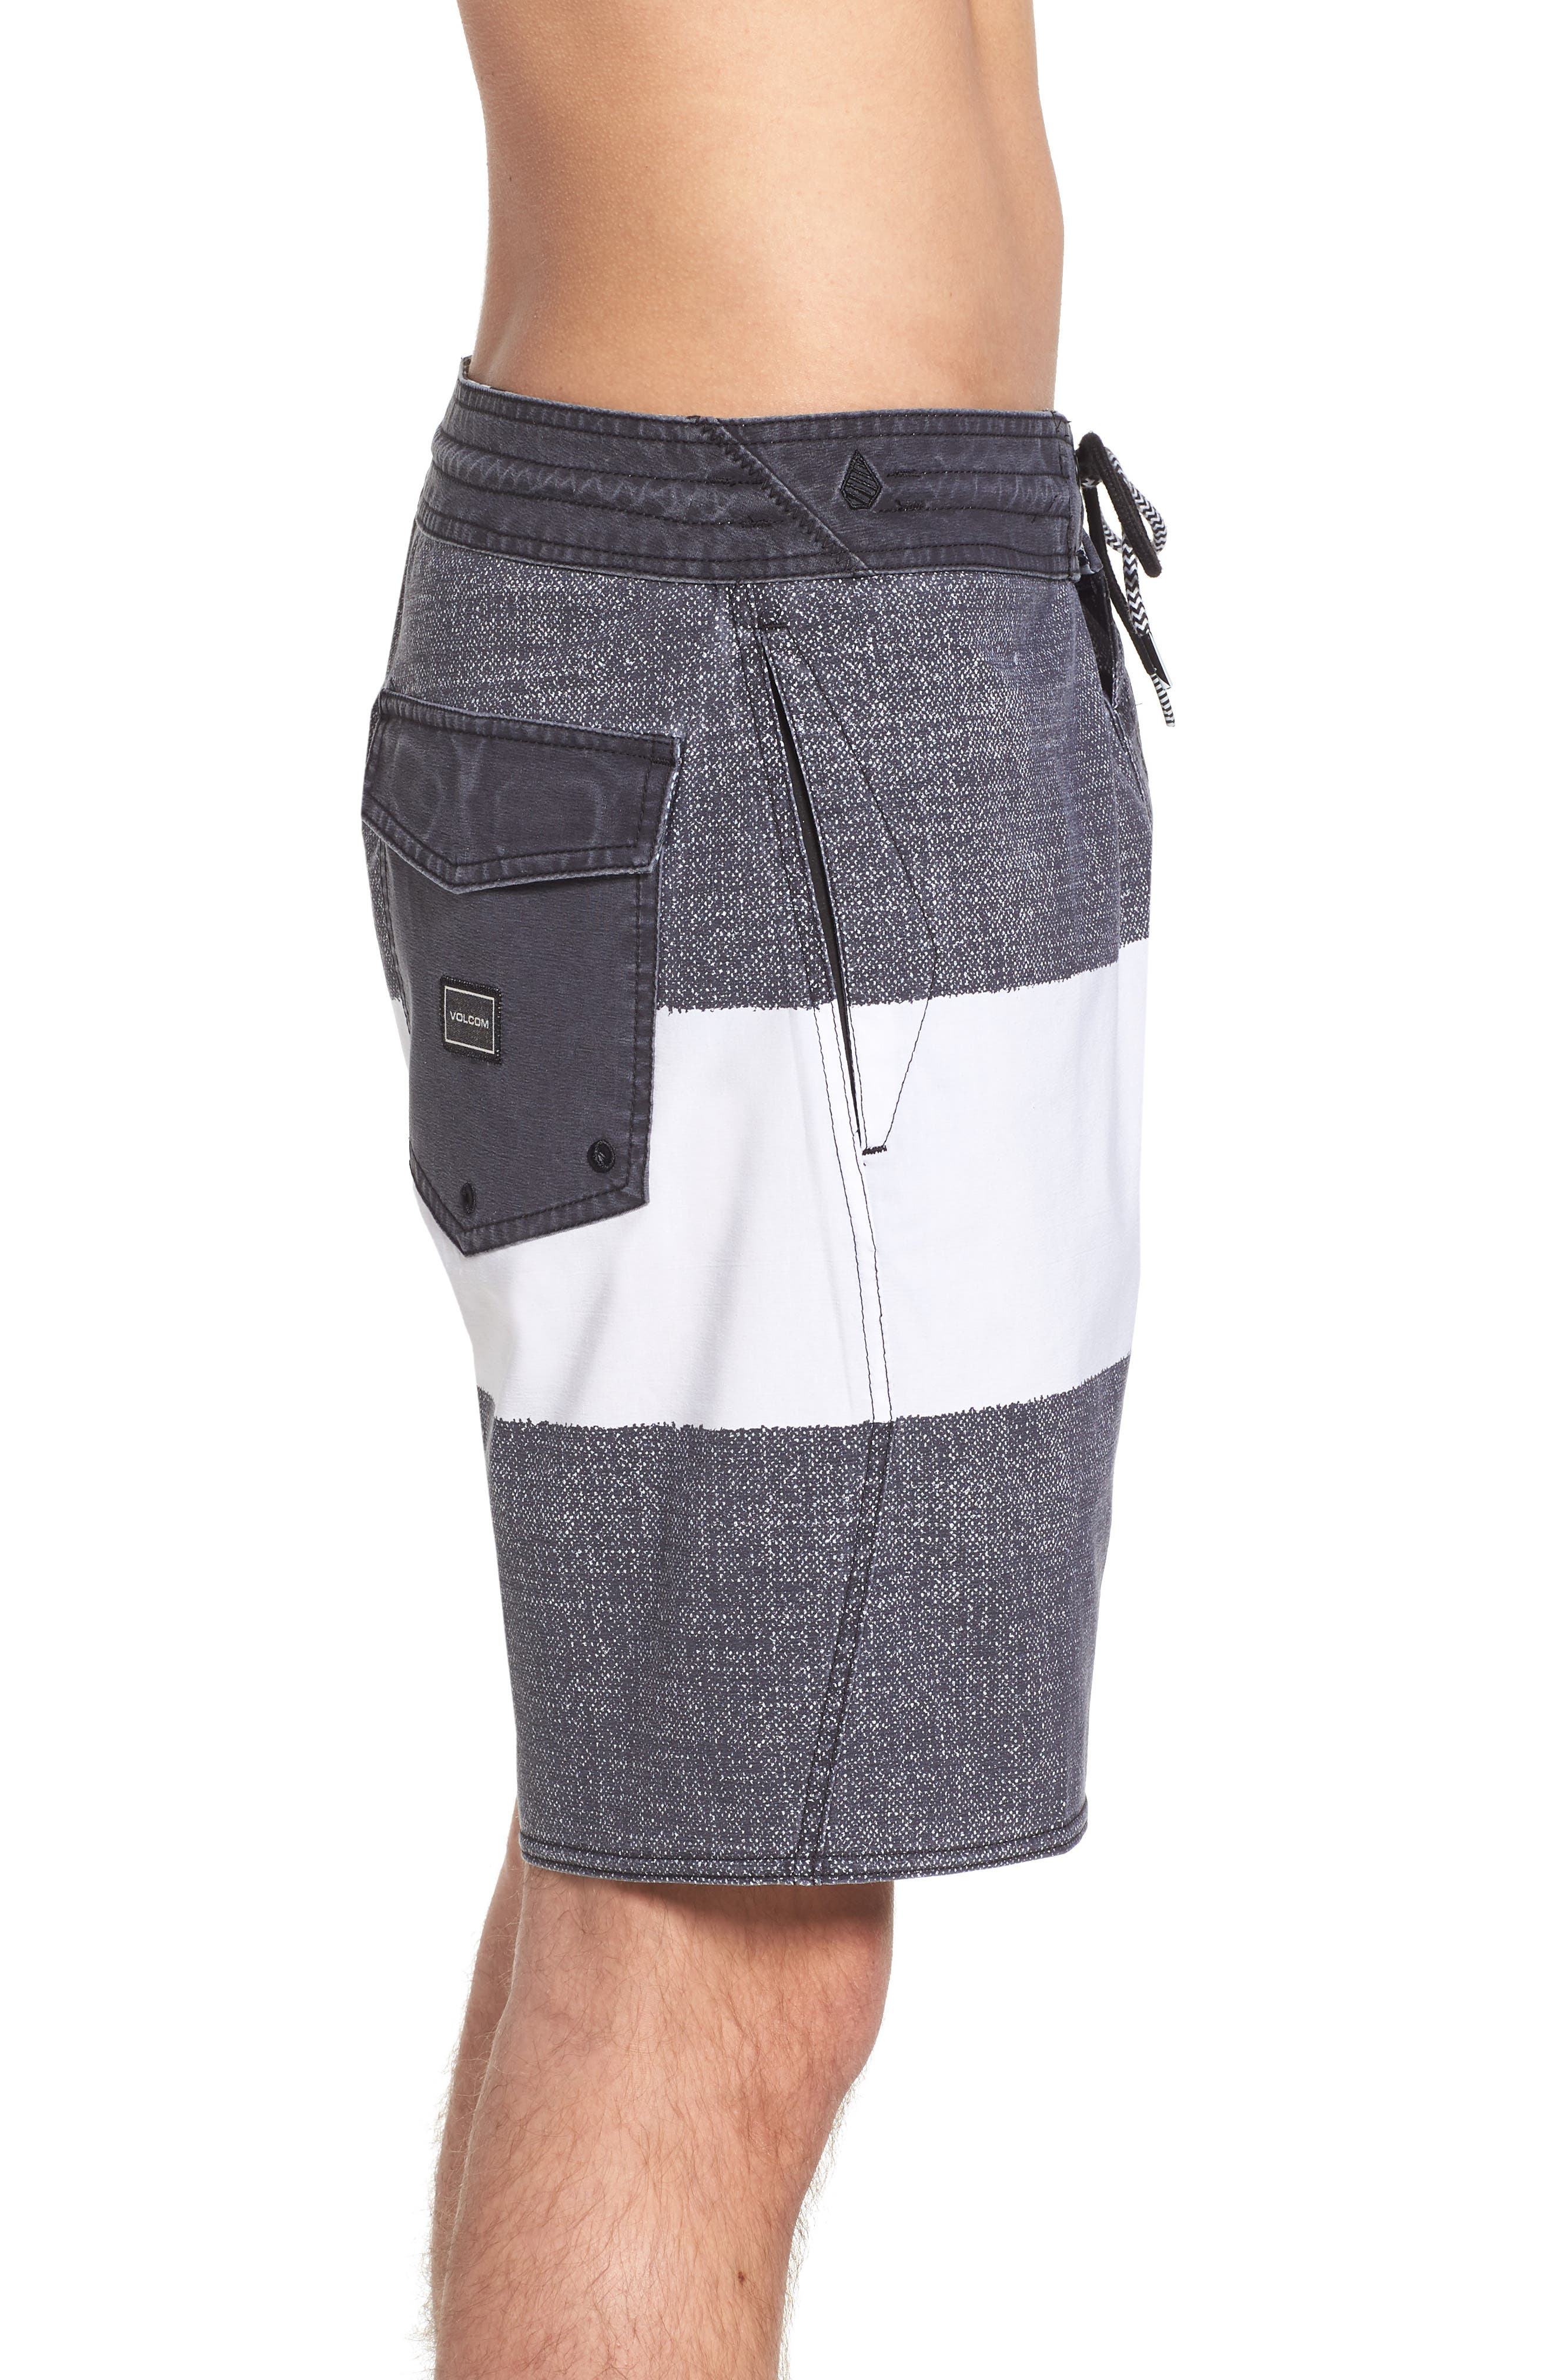 Balbroa Stoney Board Shorts,                             Alternate thumbnail 3, color,                             Stealth